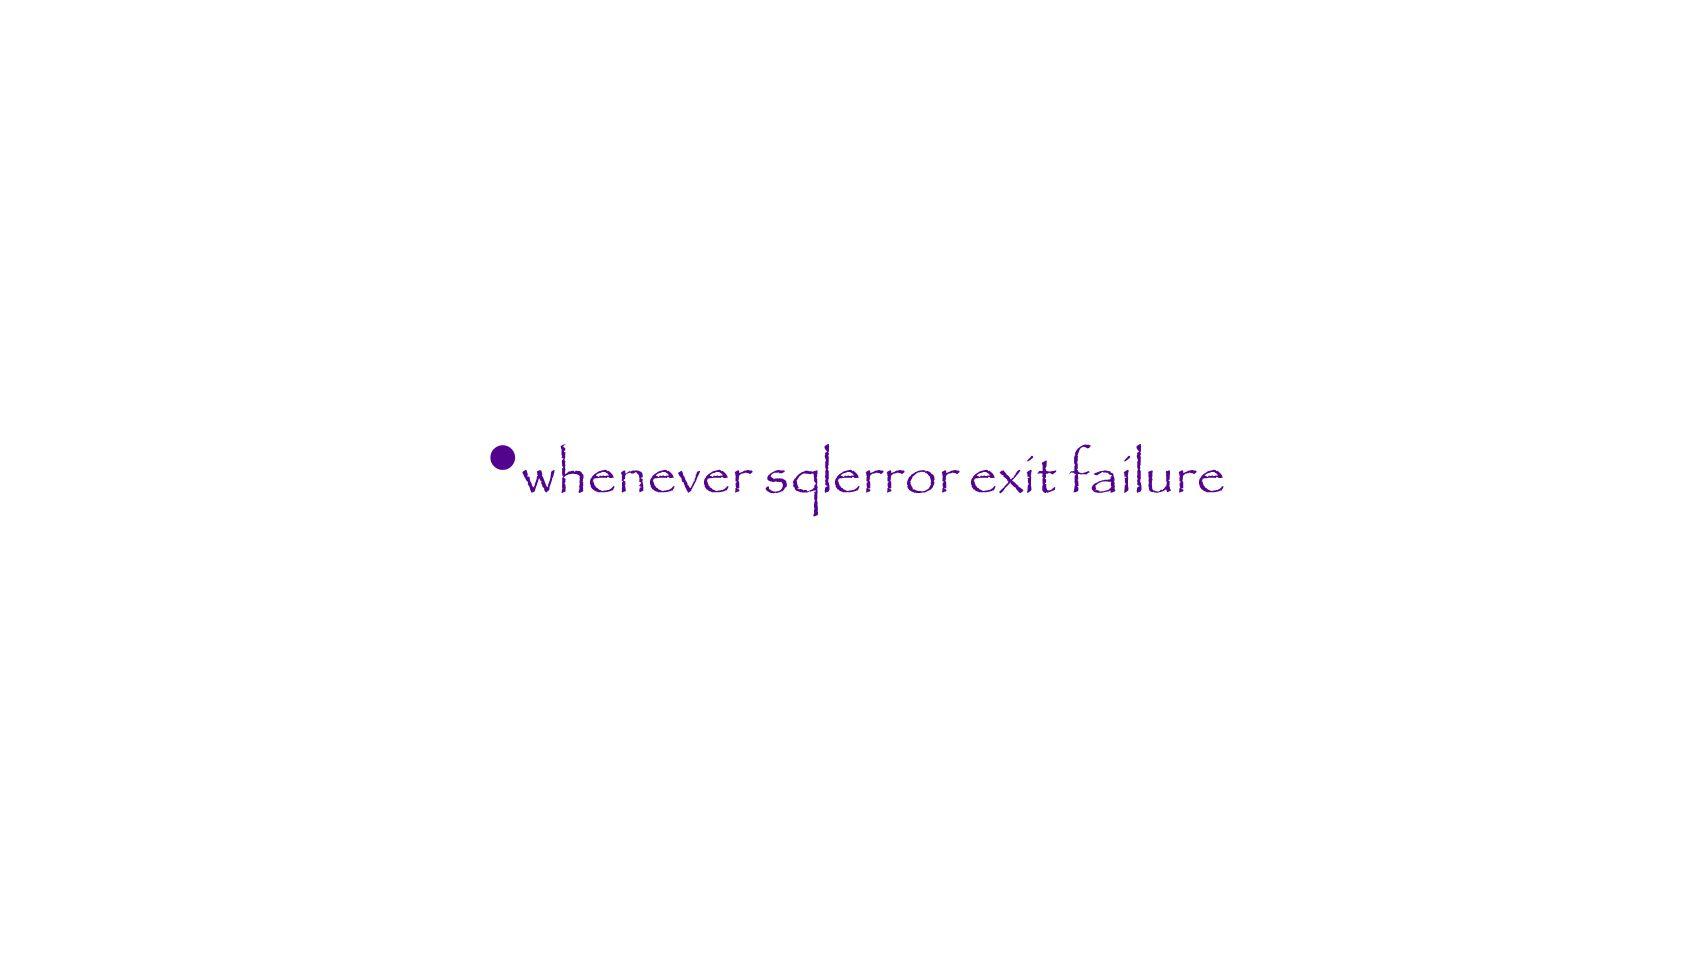 whenever sqlerror exit failure